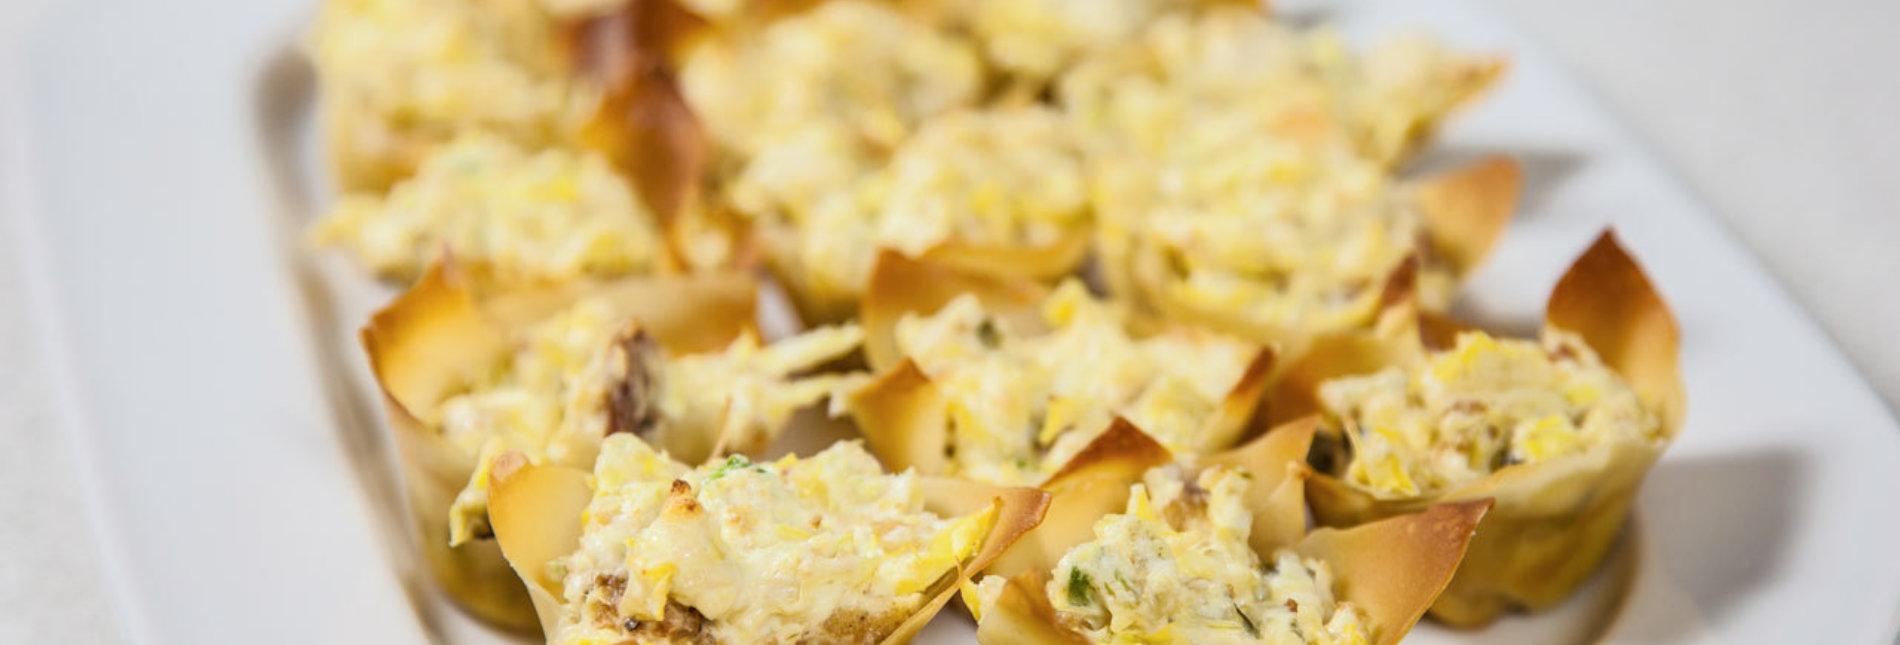 Sandras chicken jalapeno artichoke bites recipe